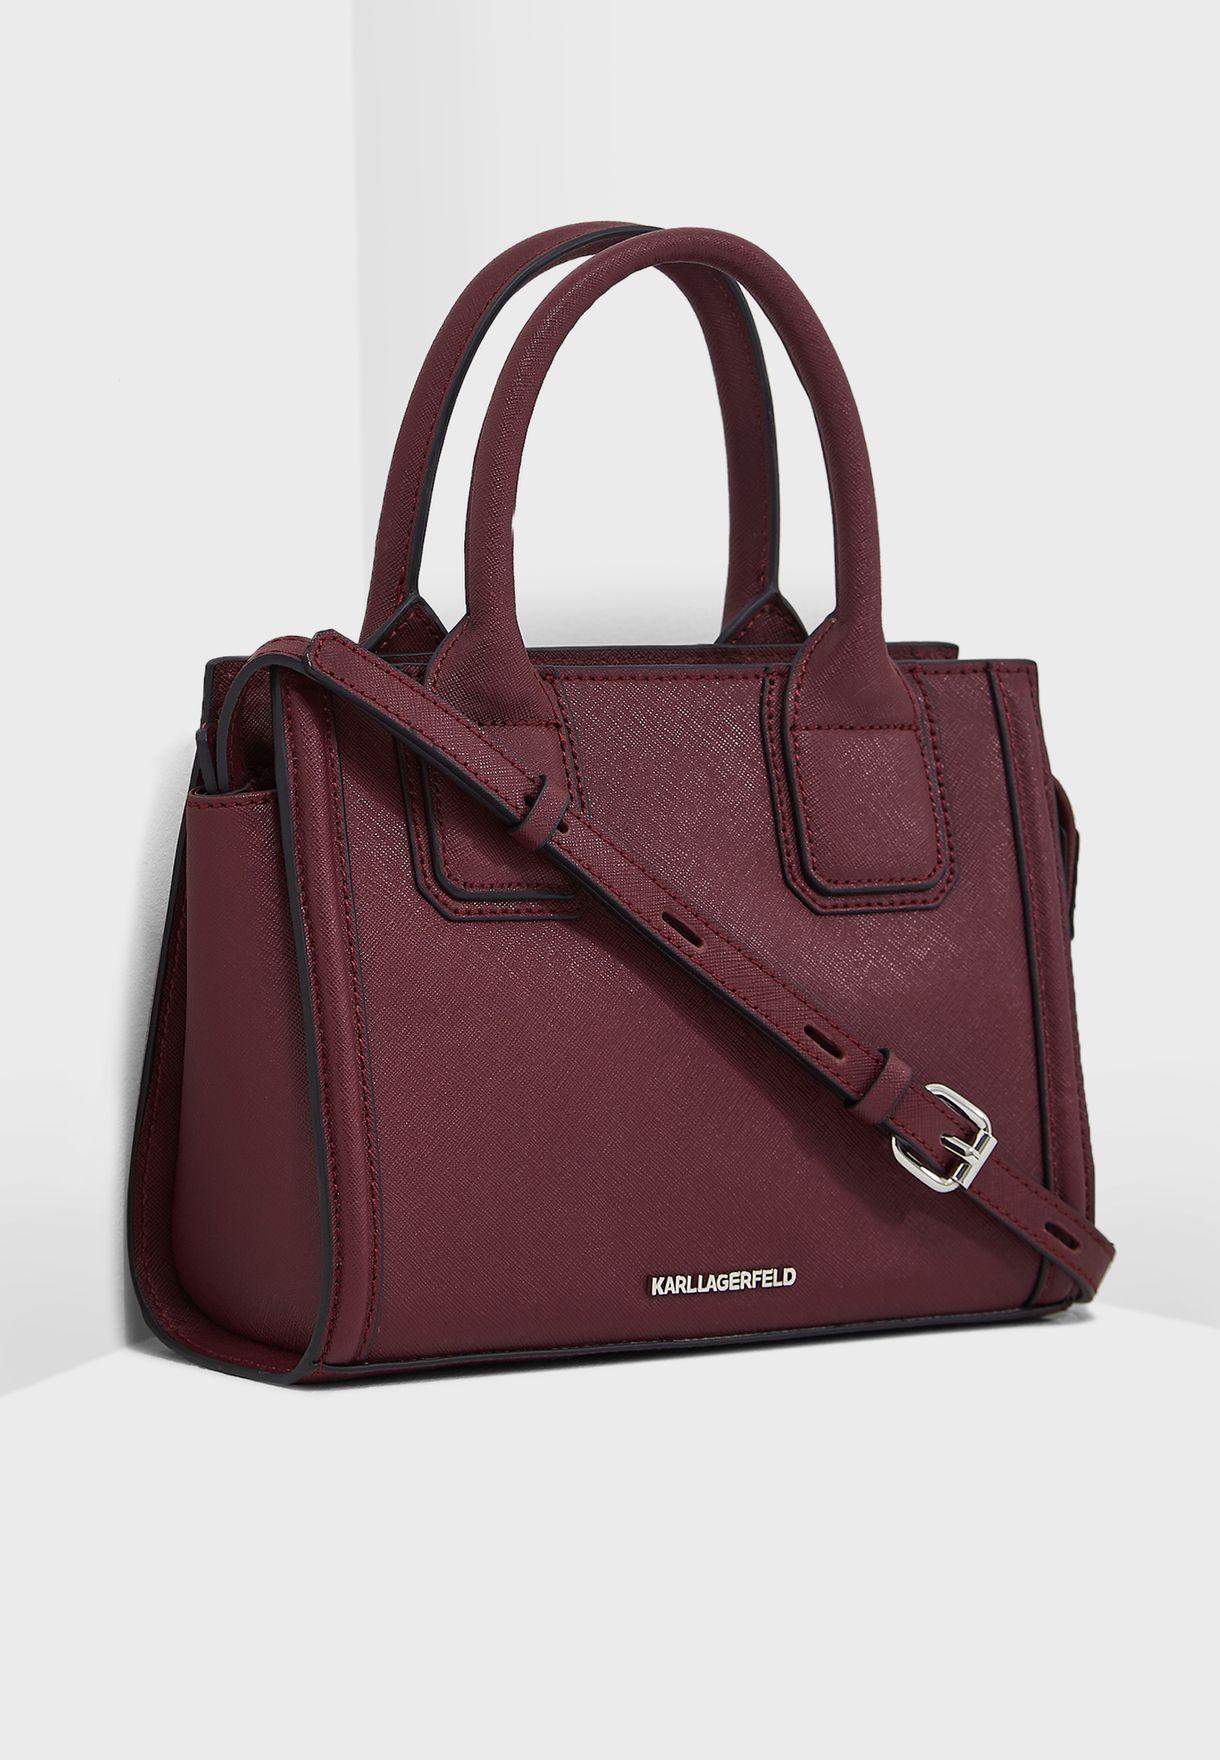 b823998a145c Shop Karl Lagerfeld burgundy Klassik Mini Tote 86KW3004-505 for ...